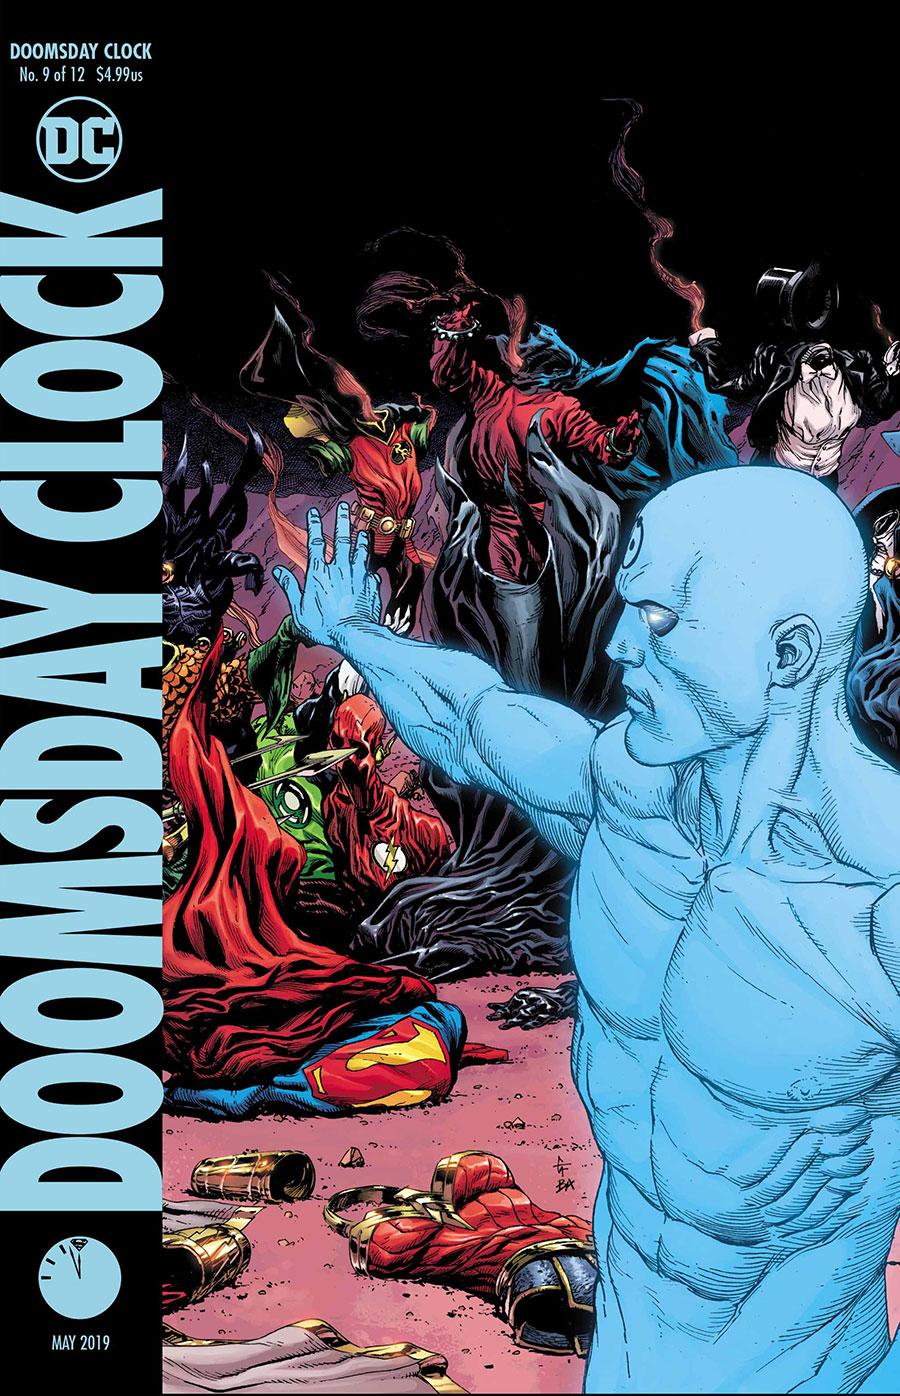 Doomsday Clock 9 Variant - DC Comics News